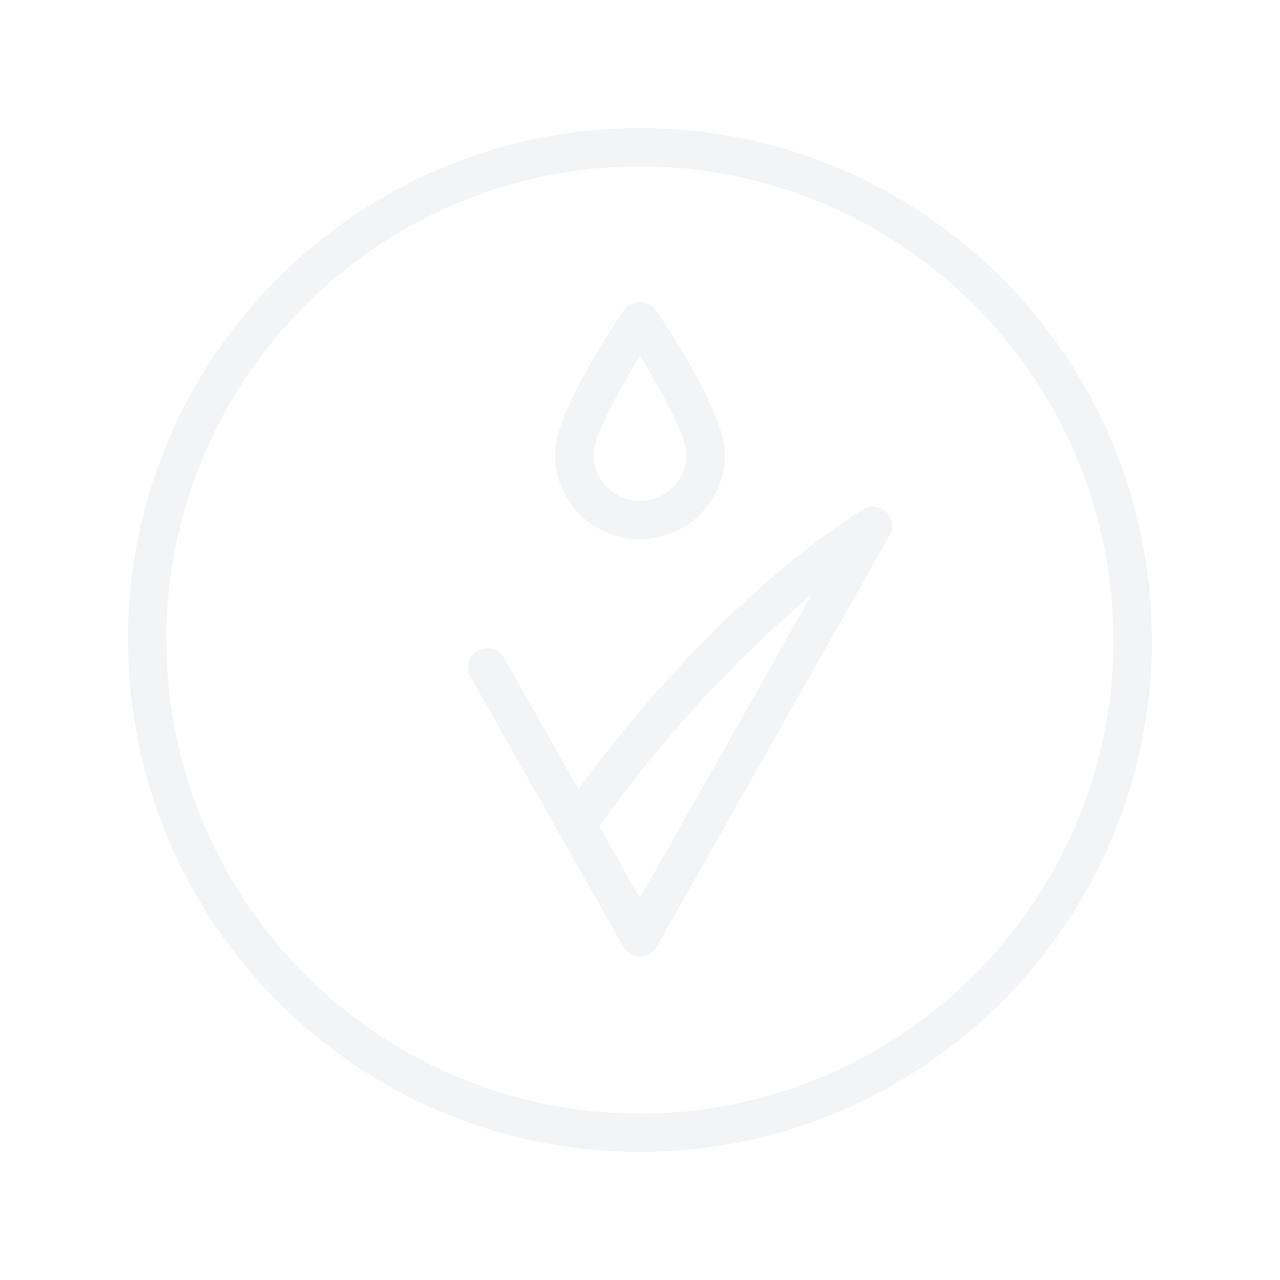 HUGO BOSS The Scent For Her 30ml Eau De Parfum Gift Set